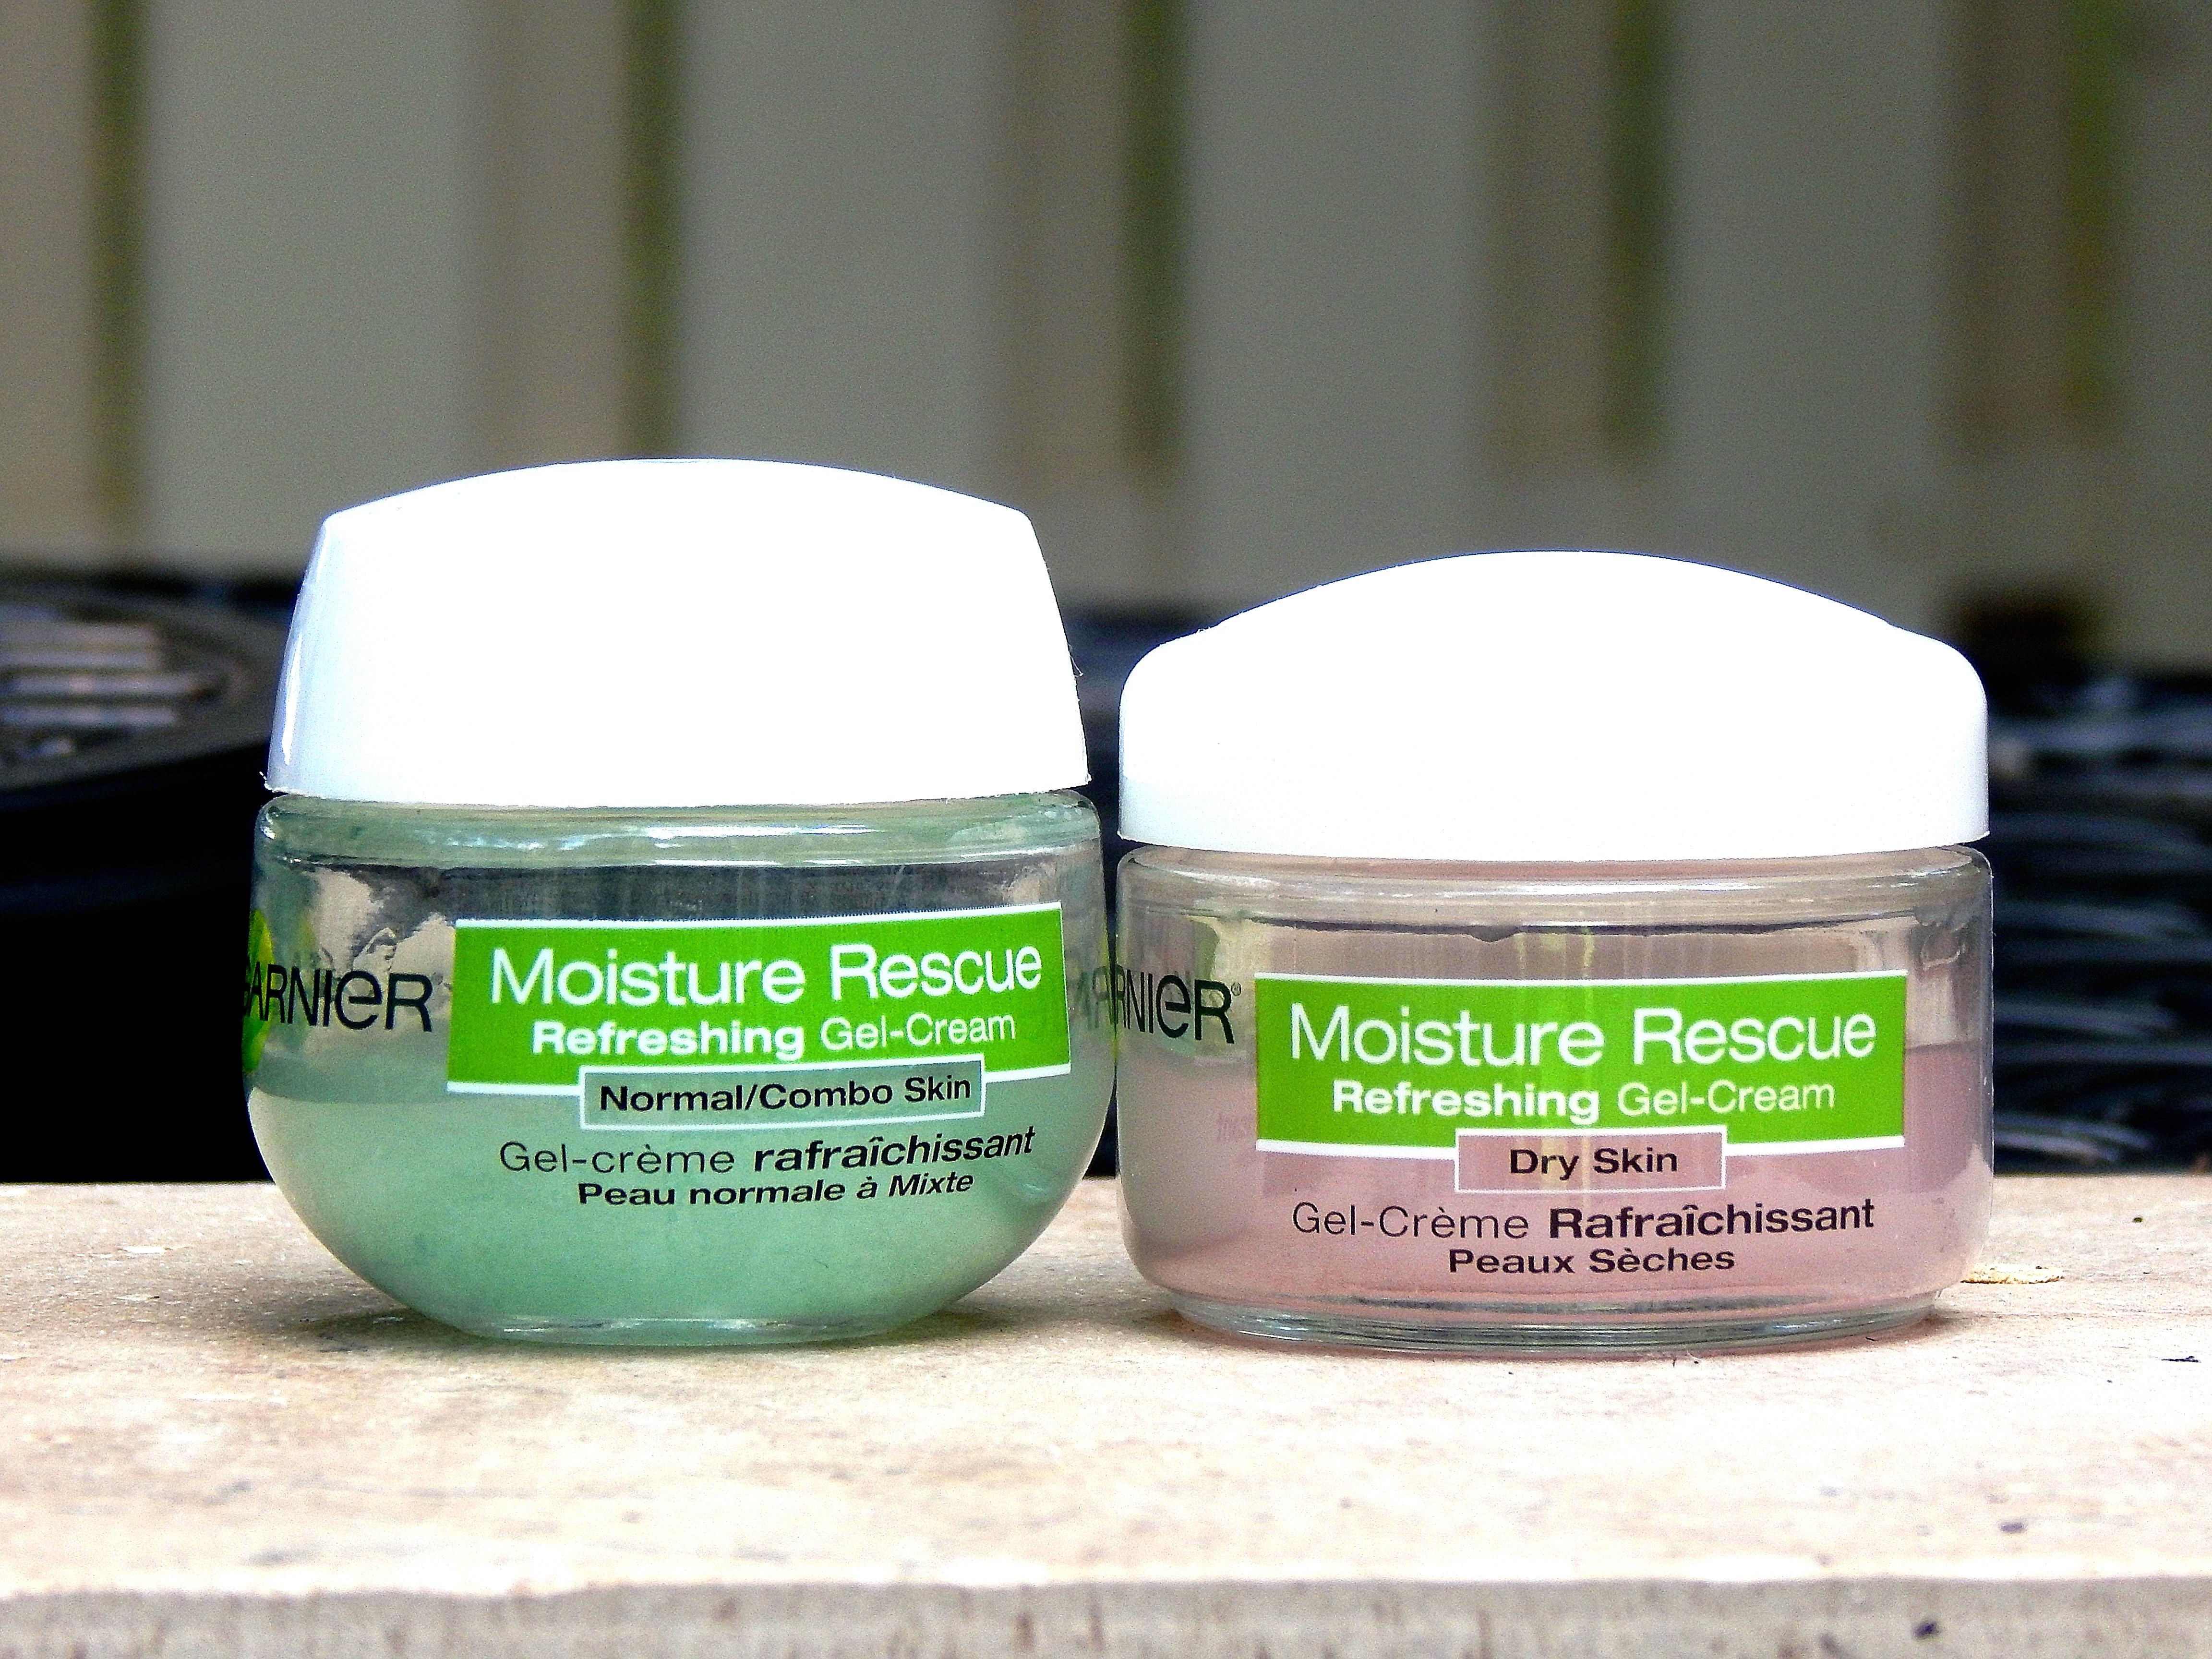 garnier gel moisturizer dry skin review